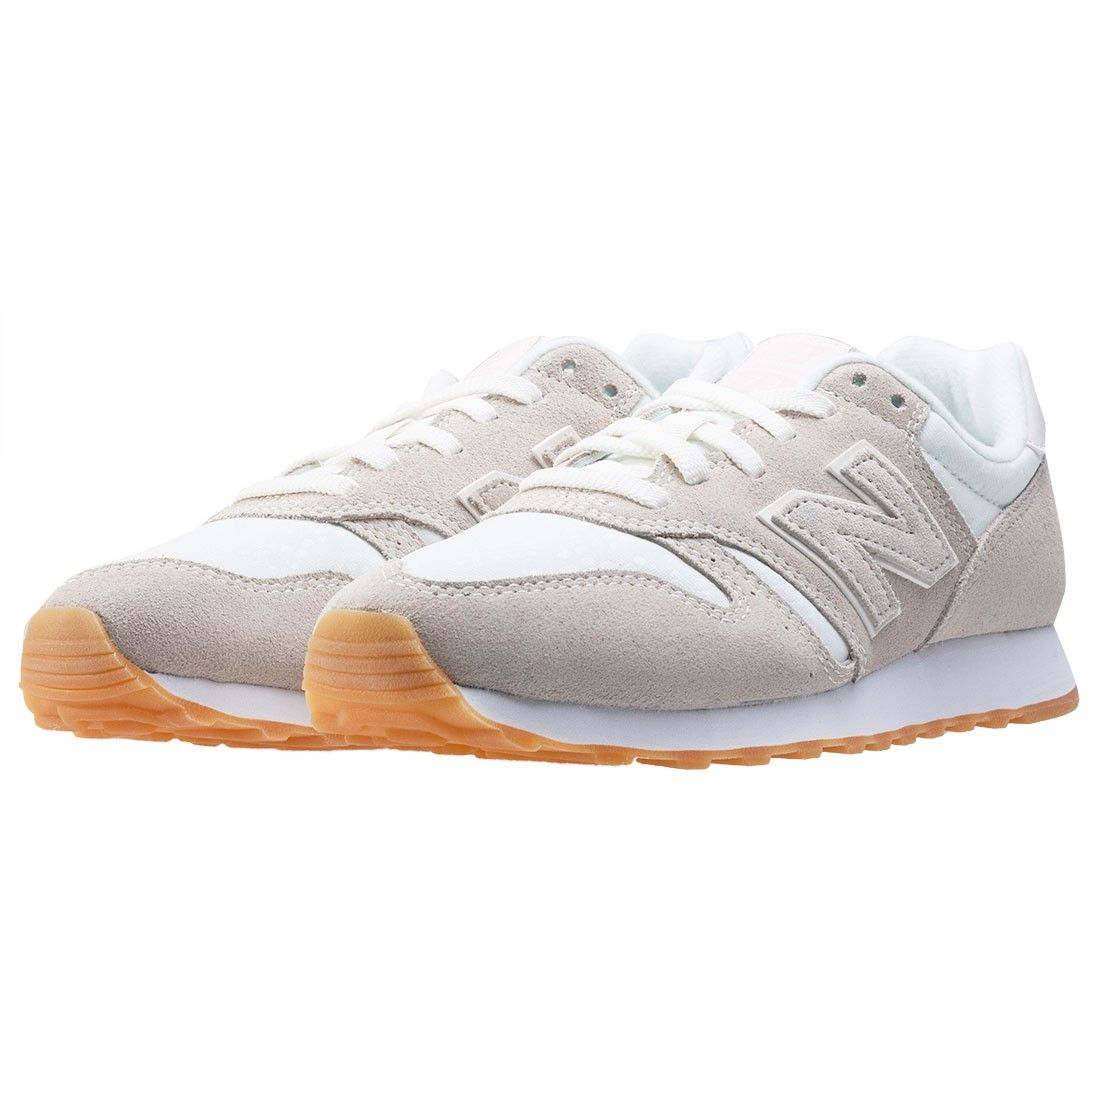 new balance 373 cream